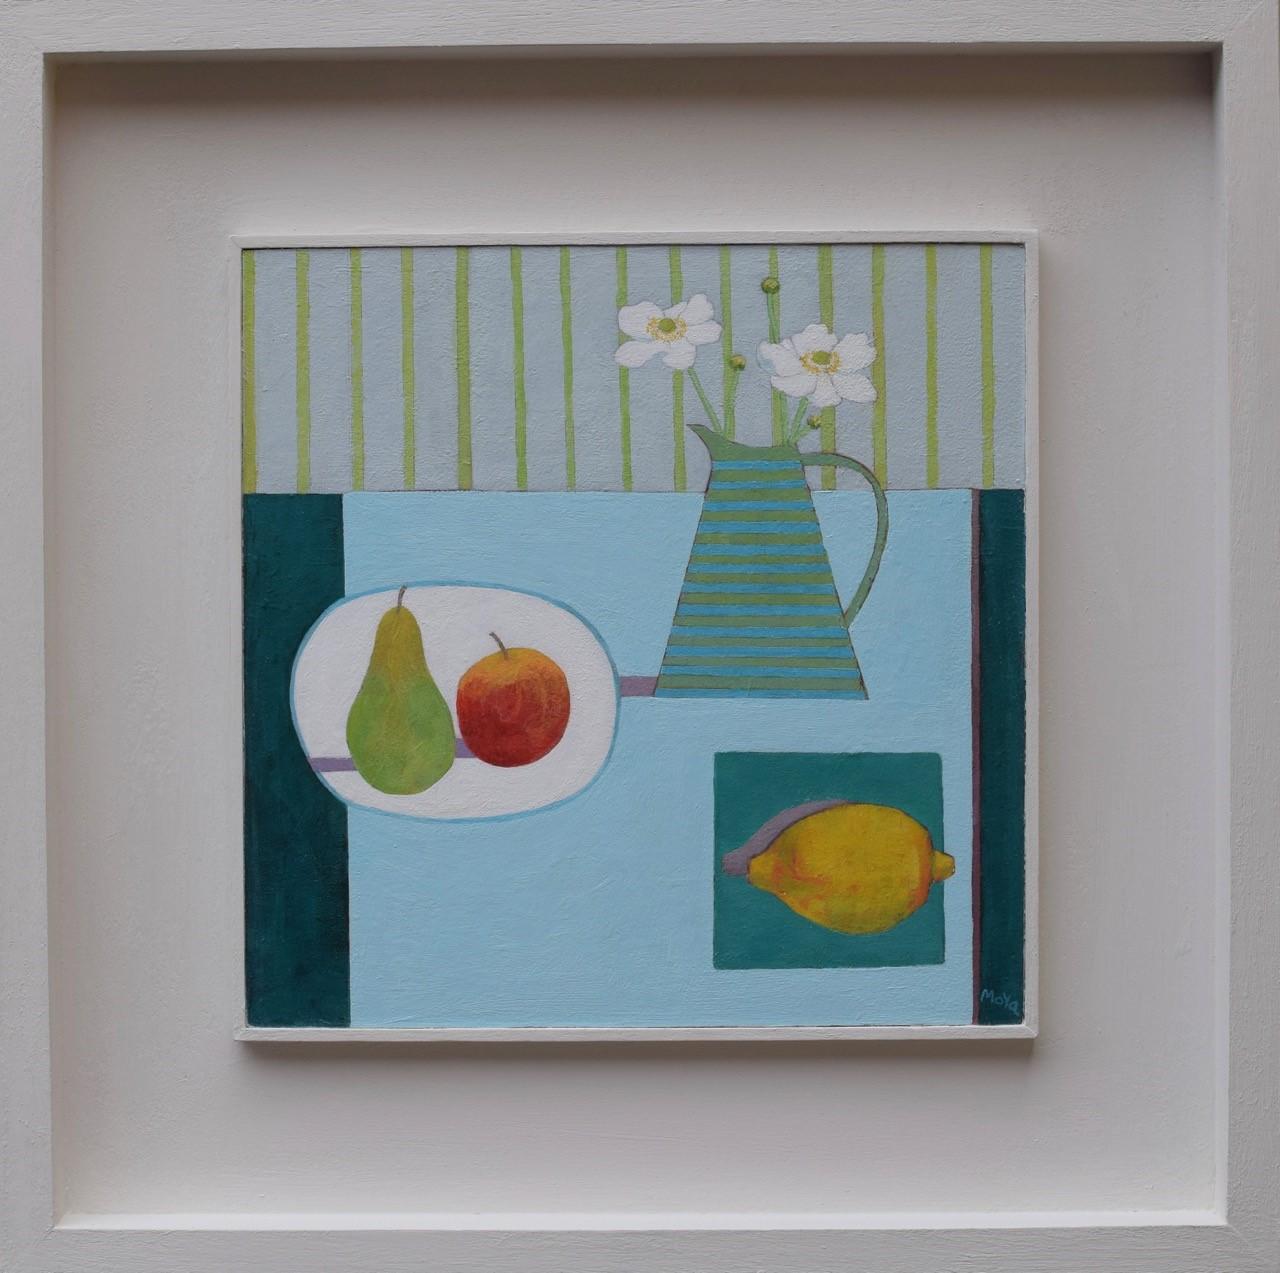 Still Life with Pear  acrylic on board  31.5 x 31.5 cm framed  £495